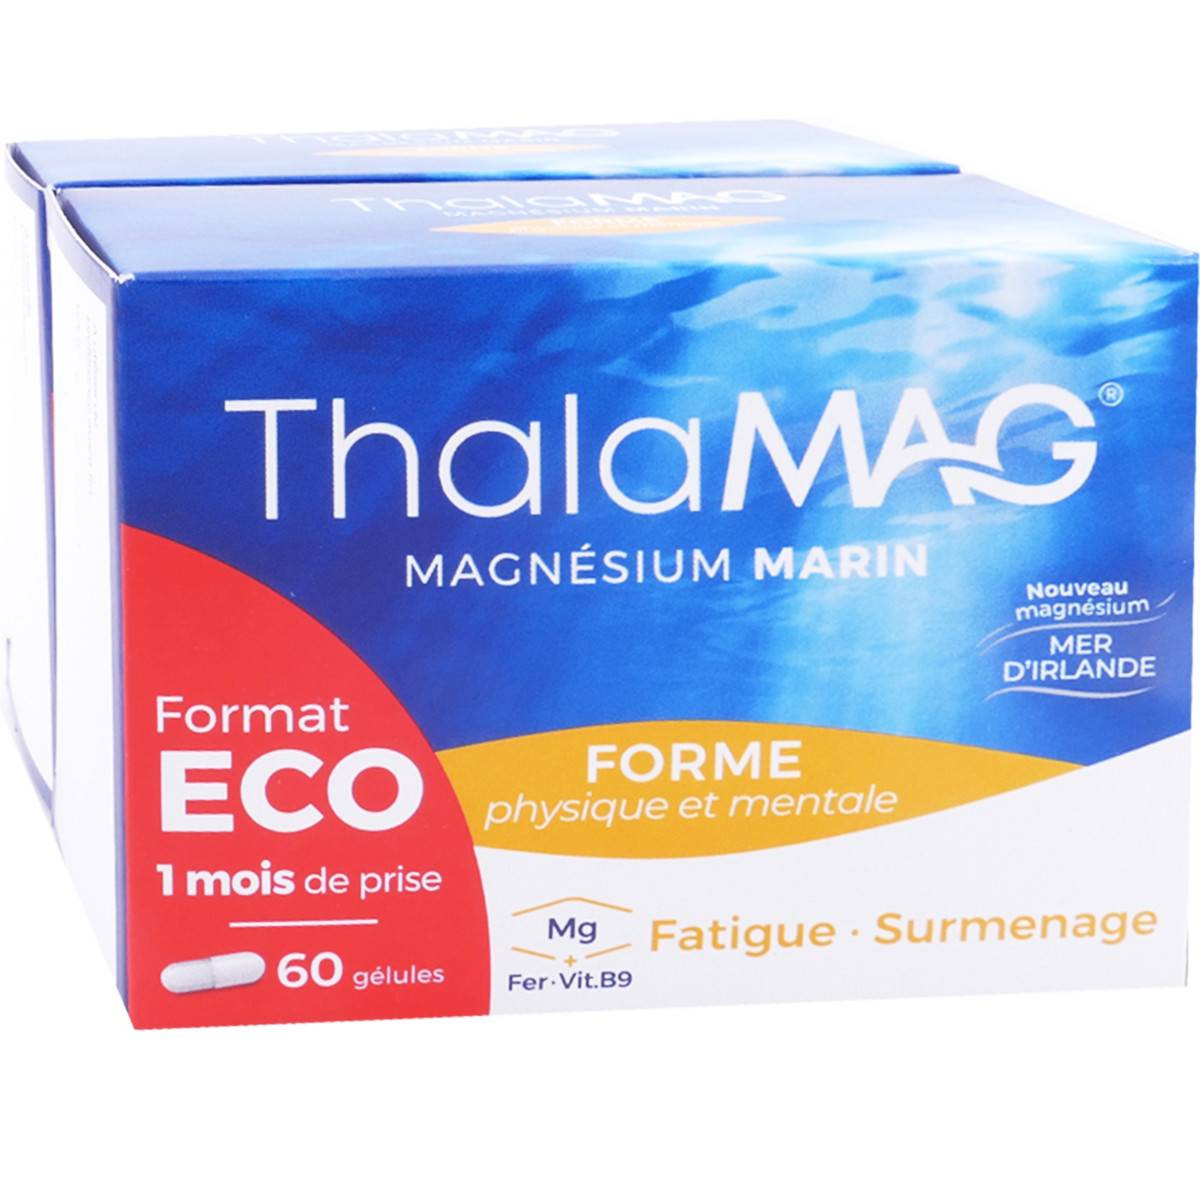 IPRAD Thalamag magnesium forme 2x60 gÉlules